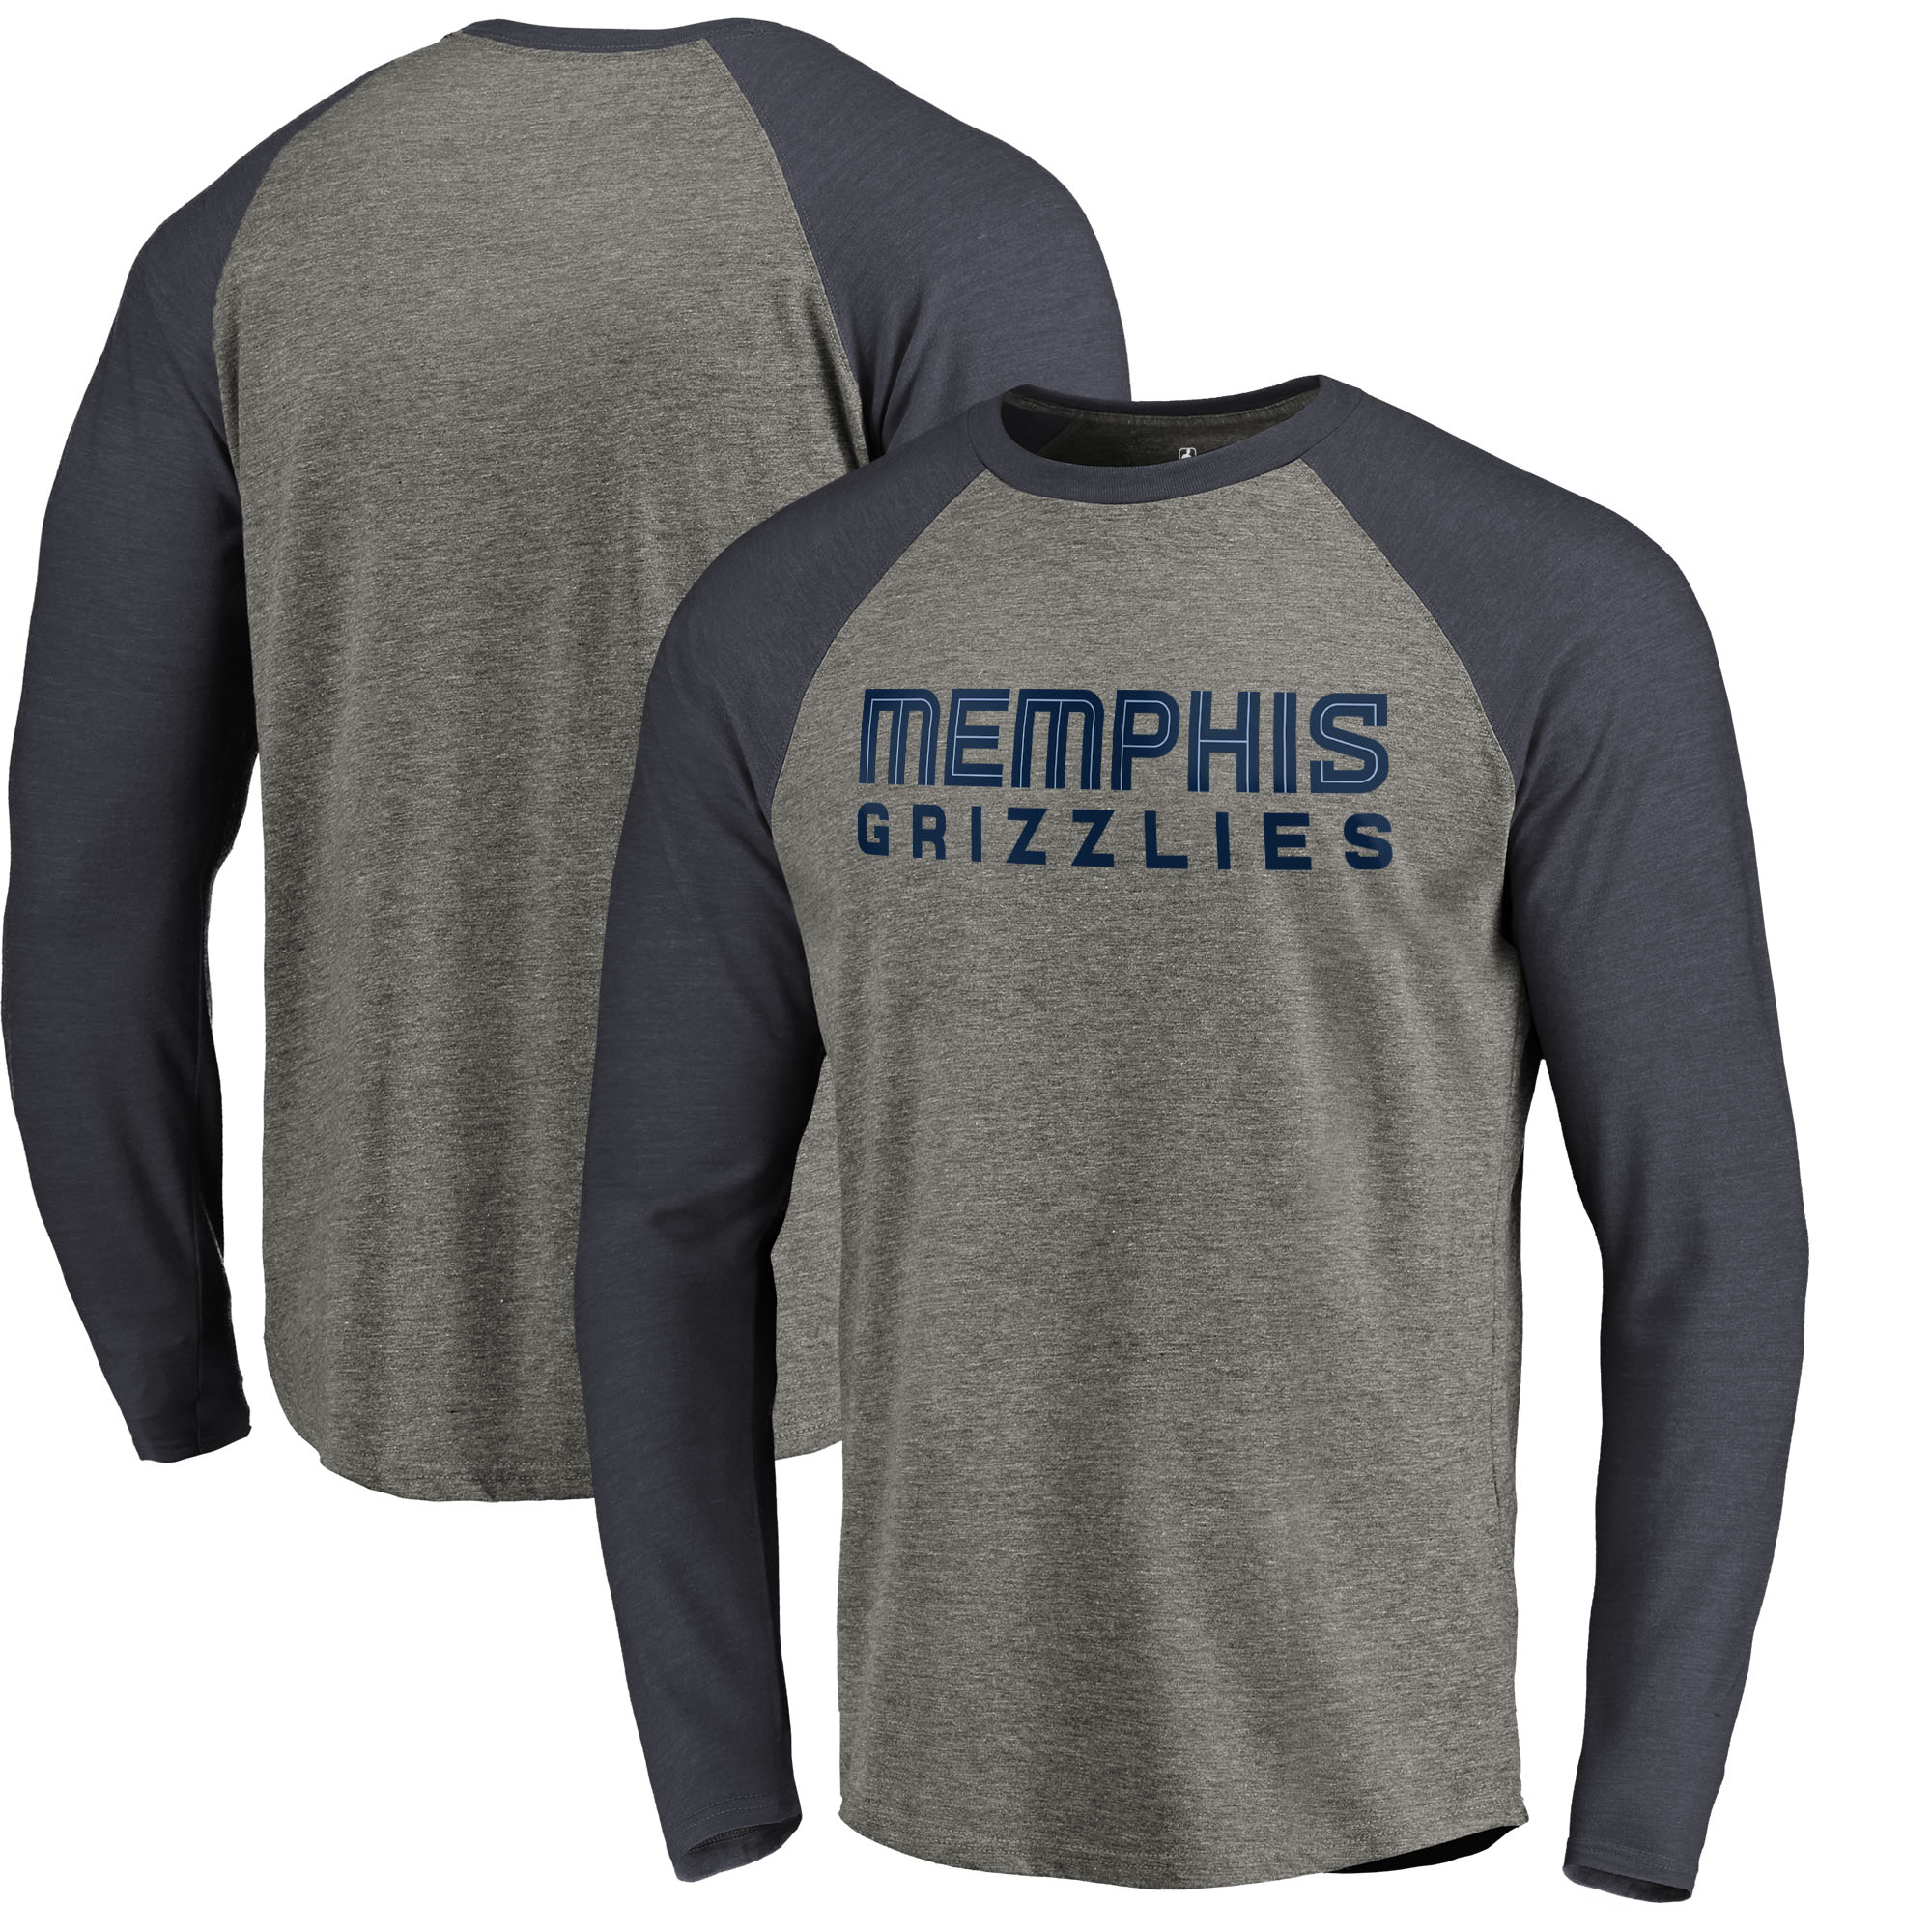 Memphis Grizzlies Fanatics Branded Primary Wordmark Tri-Blend Long Sleeve T-Shirt - Heathered Gray